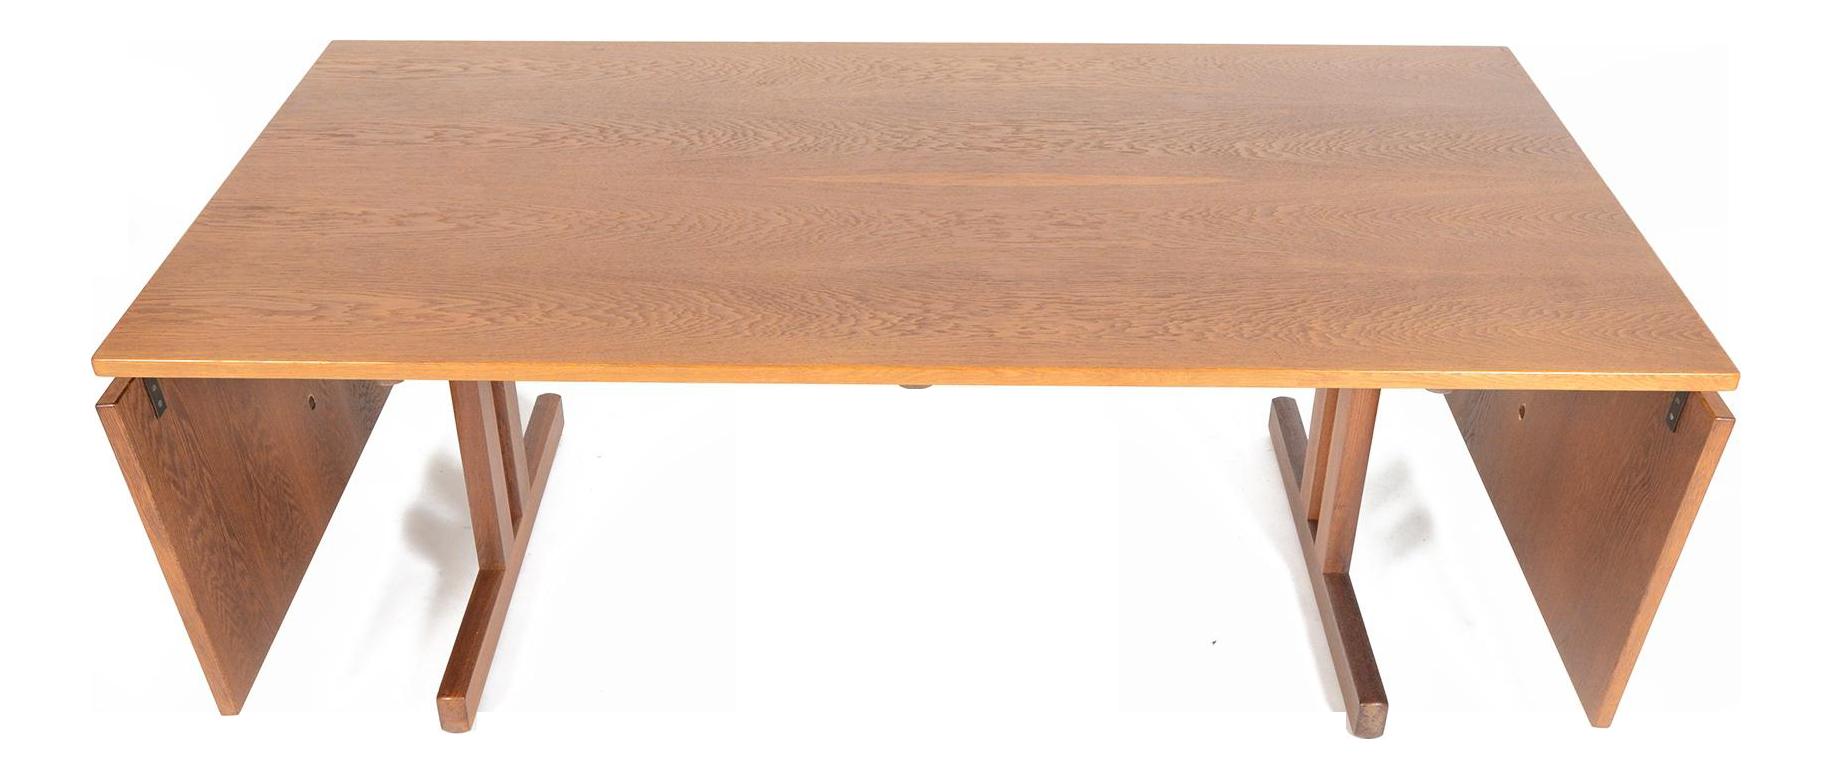 oak drop leaf craftsman style dining table chairish. Black Bedroom Furniture Sets. Home Design Ideas